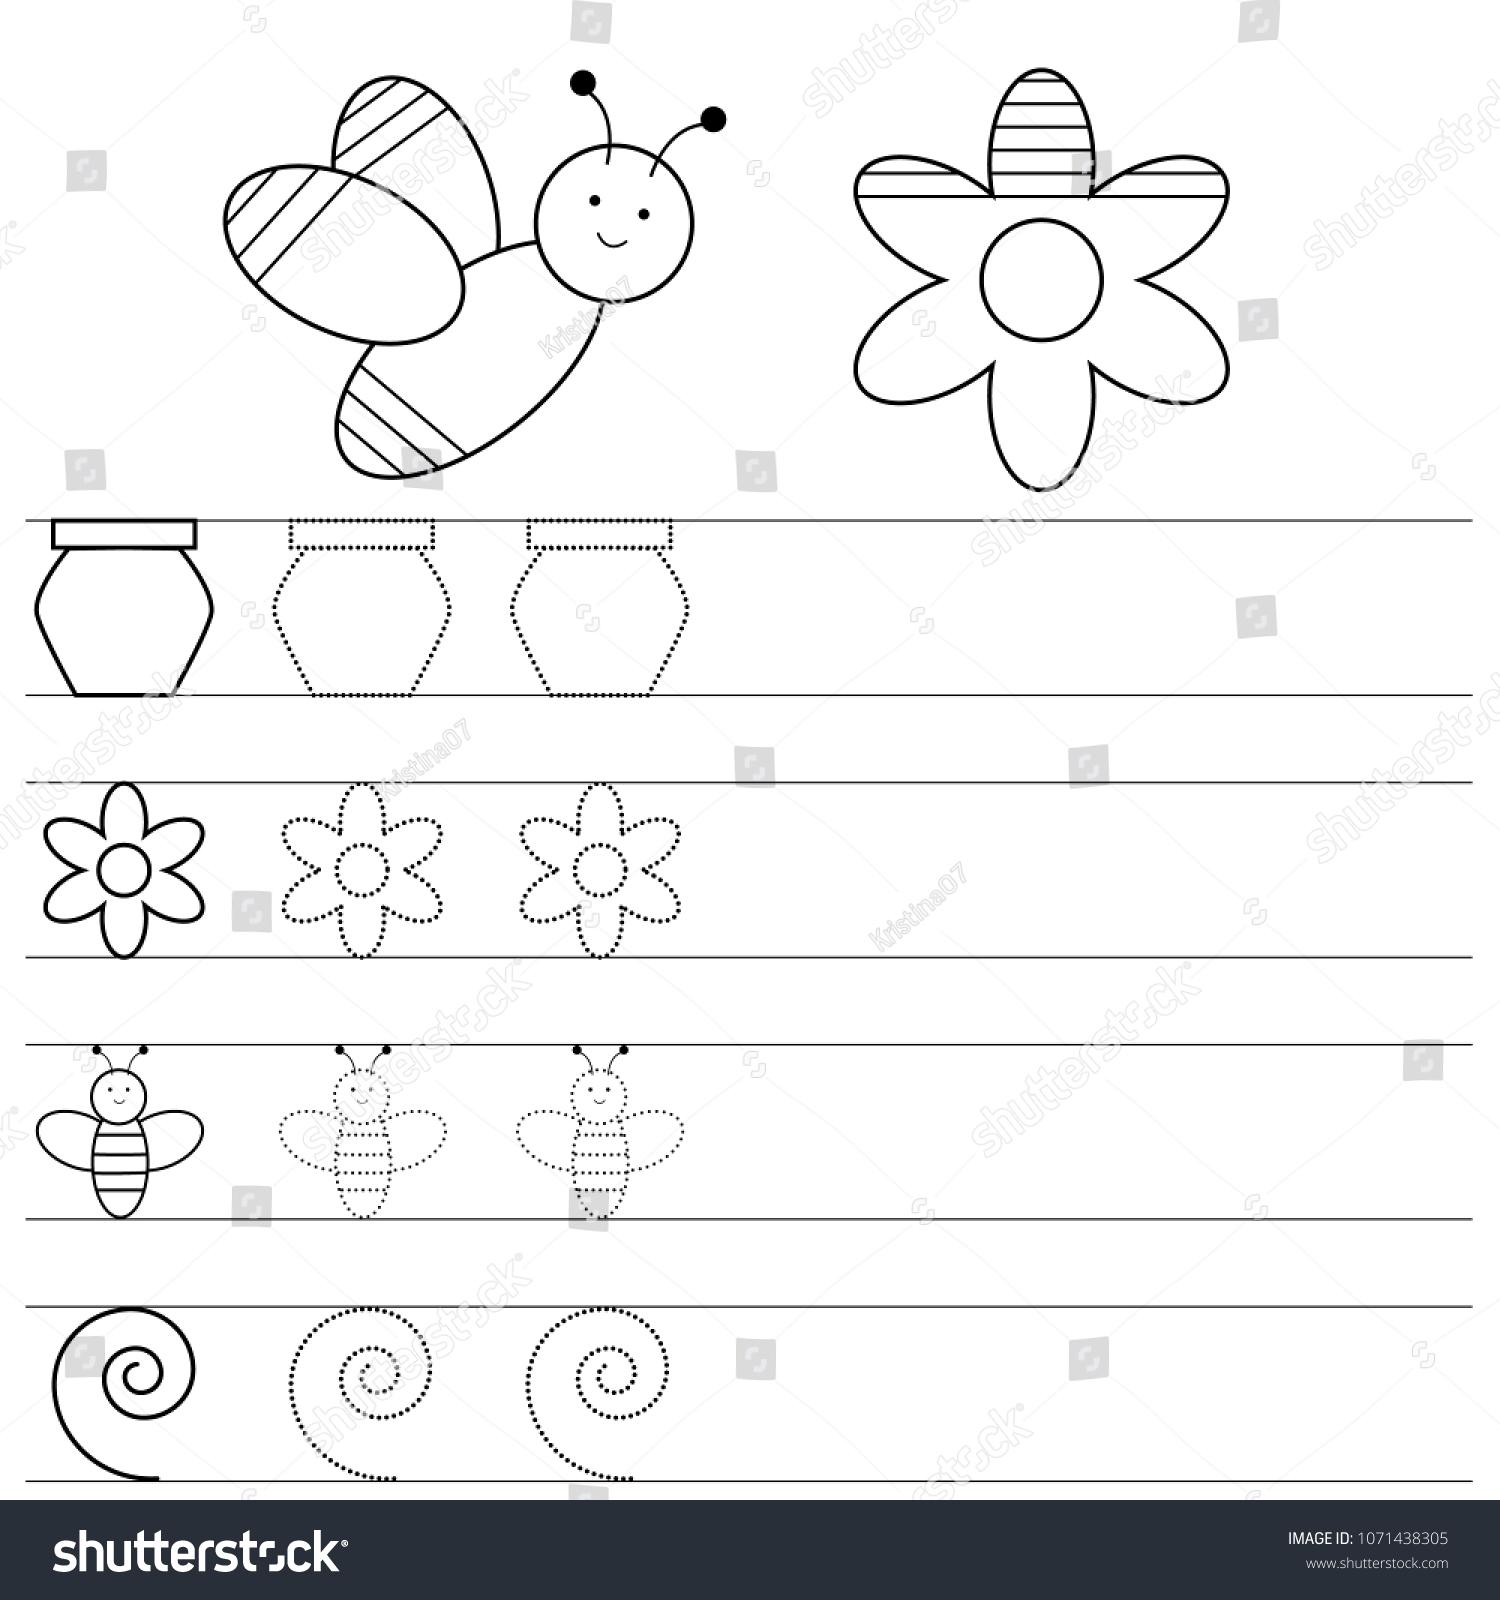 Worksheet Preschool Kids Handwriting Practice Writing Stock Vector